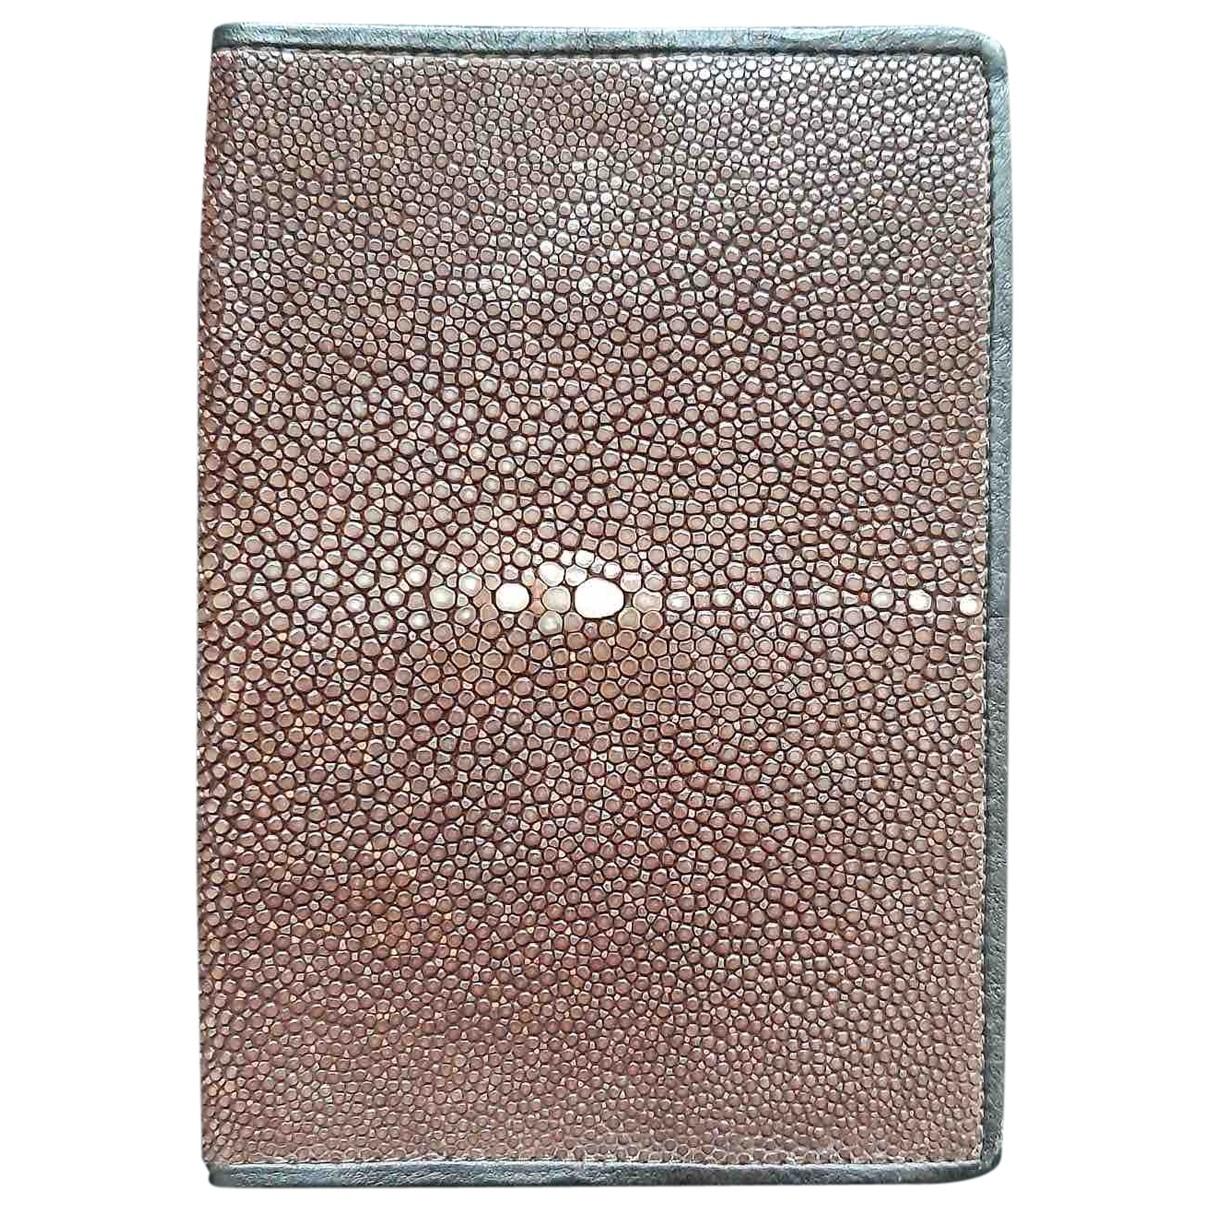 Giorgio Armani \N Brown Stingray Small bag, wallet & cases for Men \N